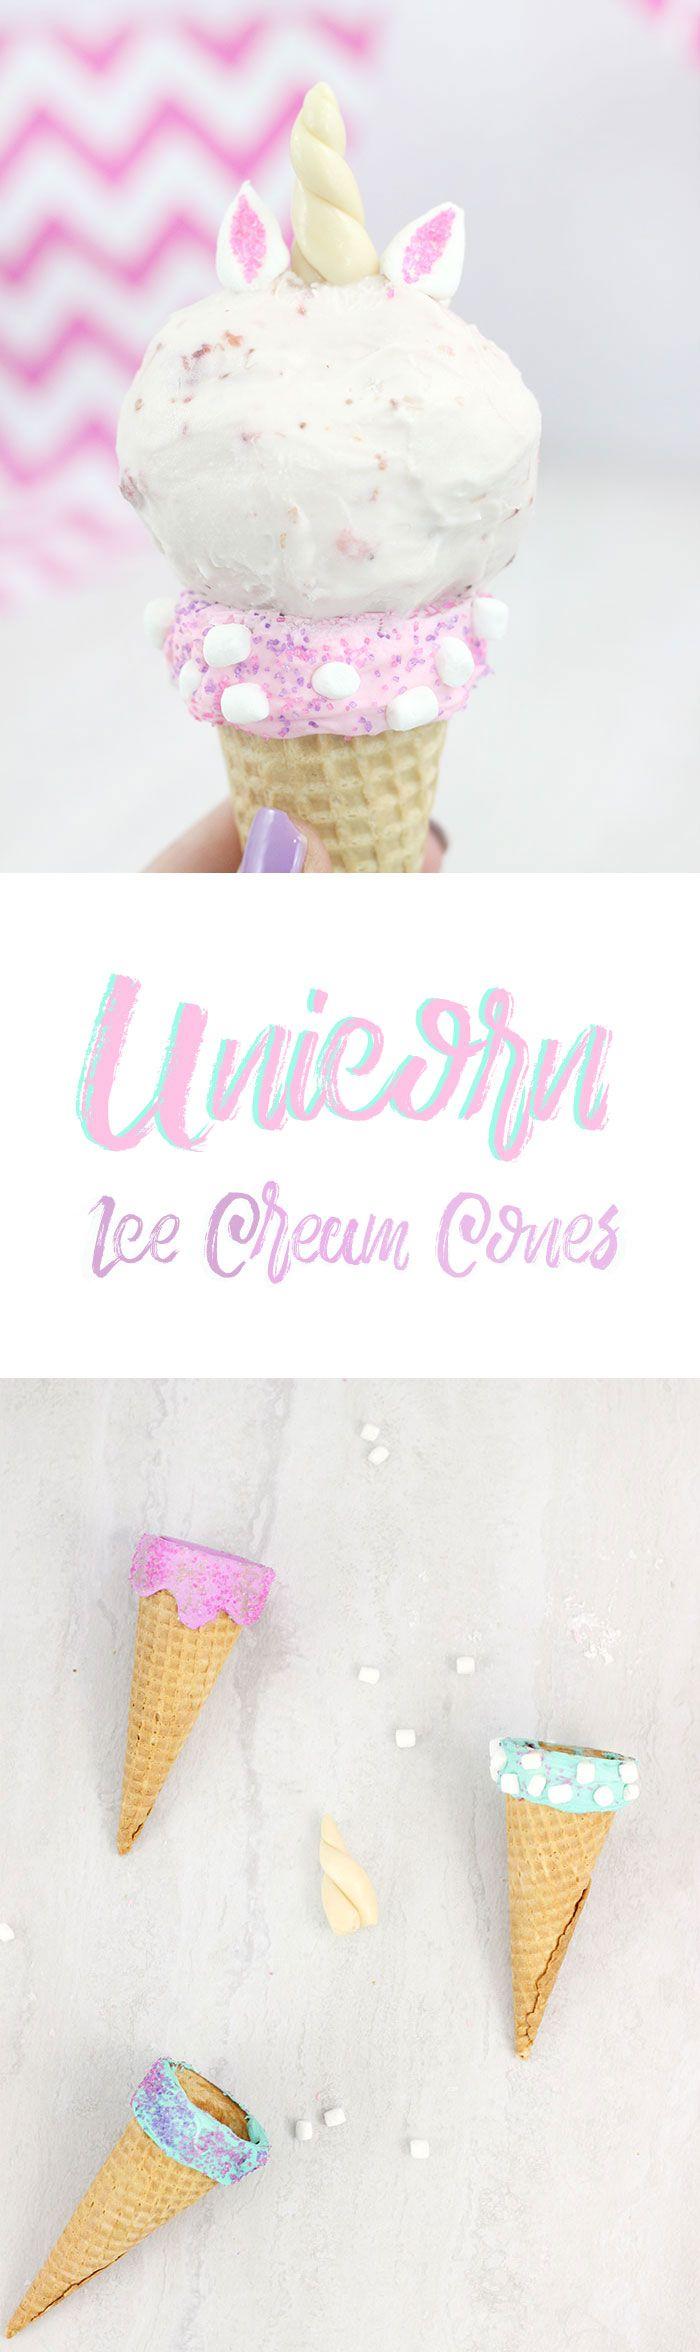 Unicorn Ice Cream Cones. Make magical ice cream cones the easy way with frosting.